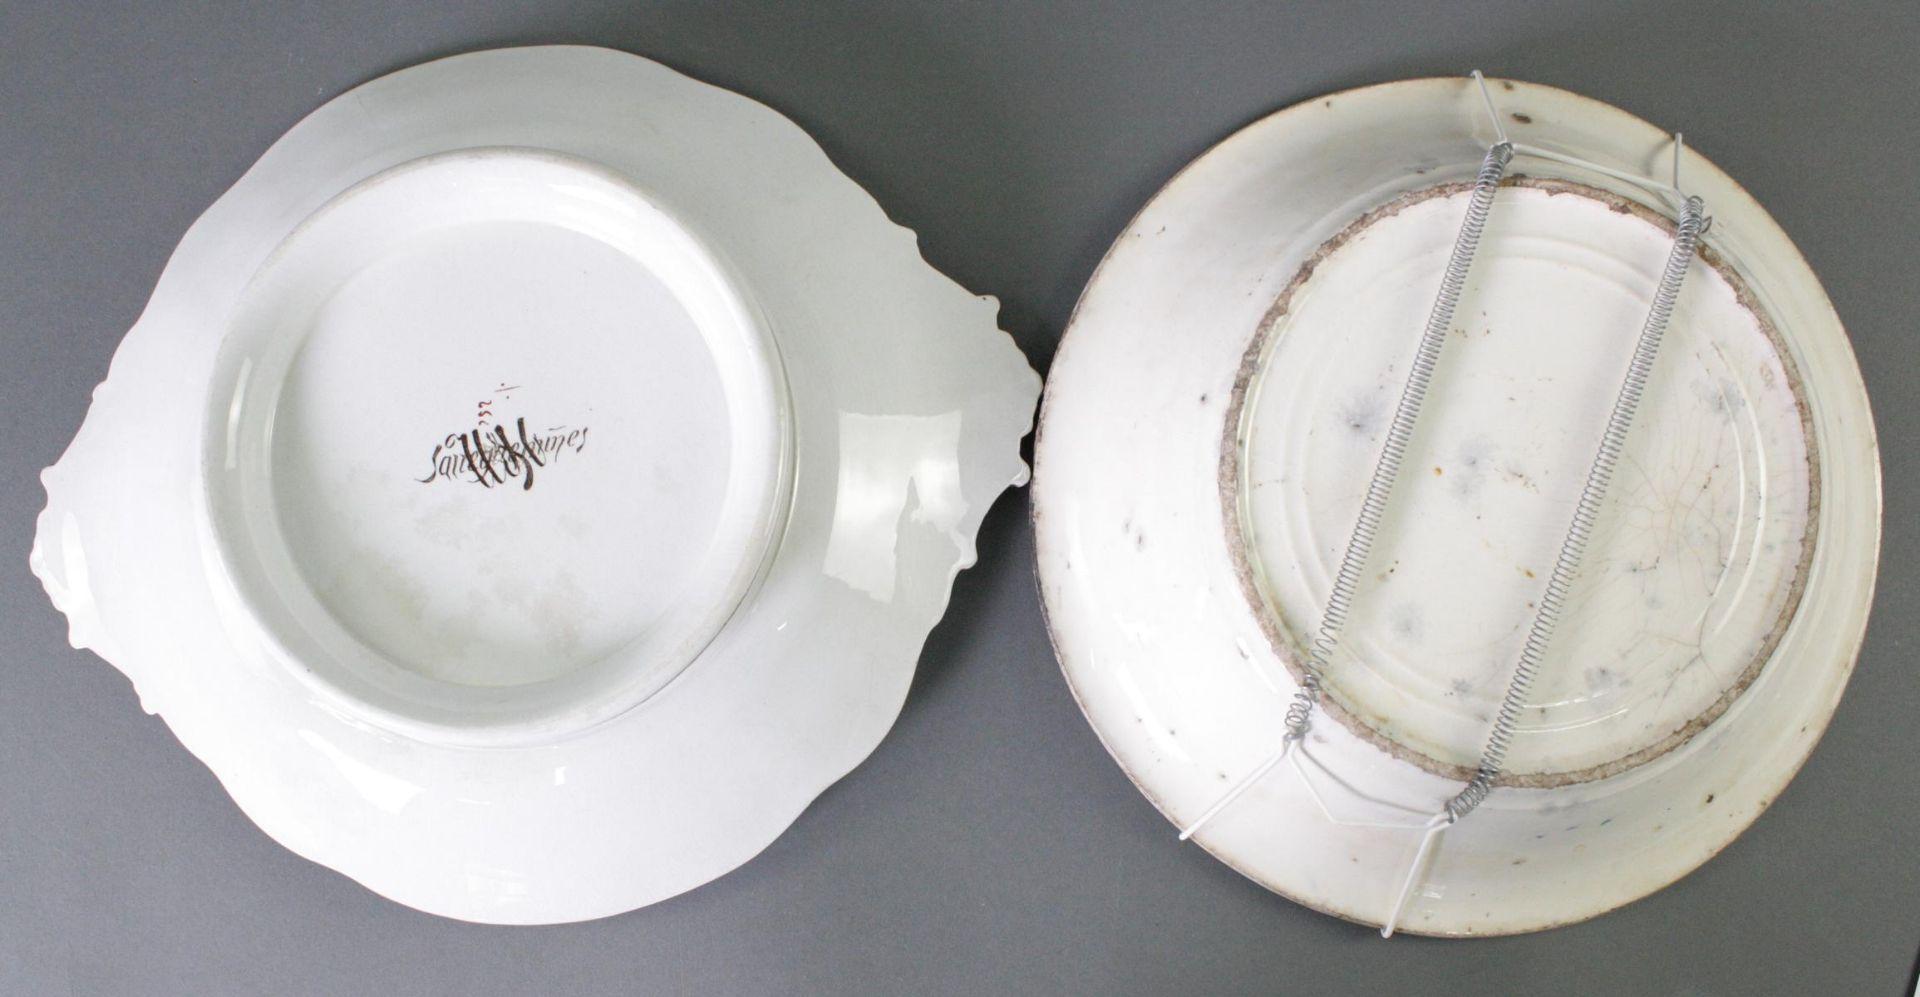 2 Keramikschalen 19. Jahrhundert - Bild 3 aus 3